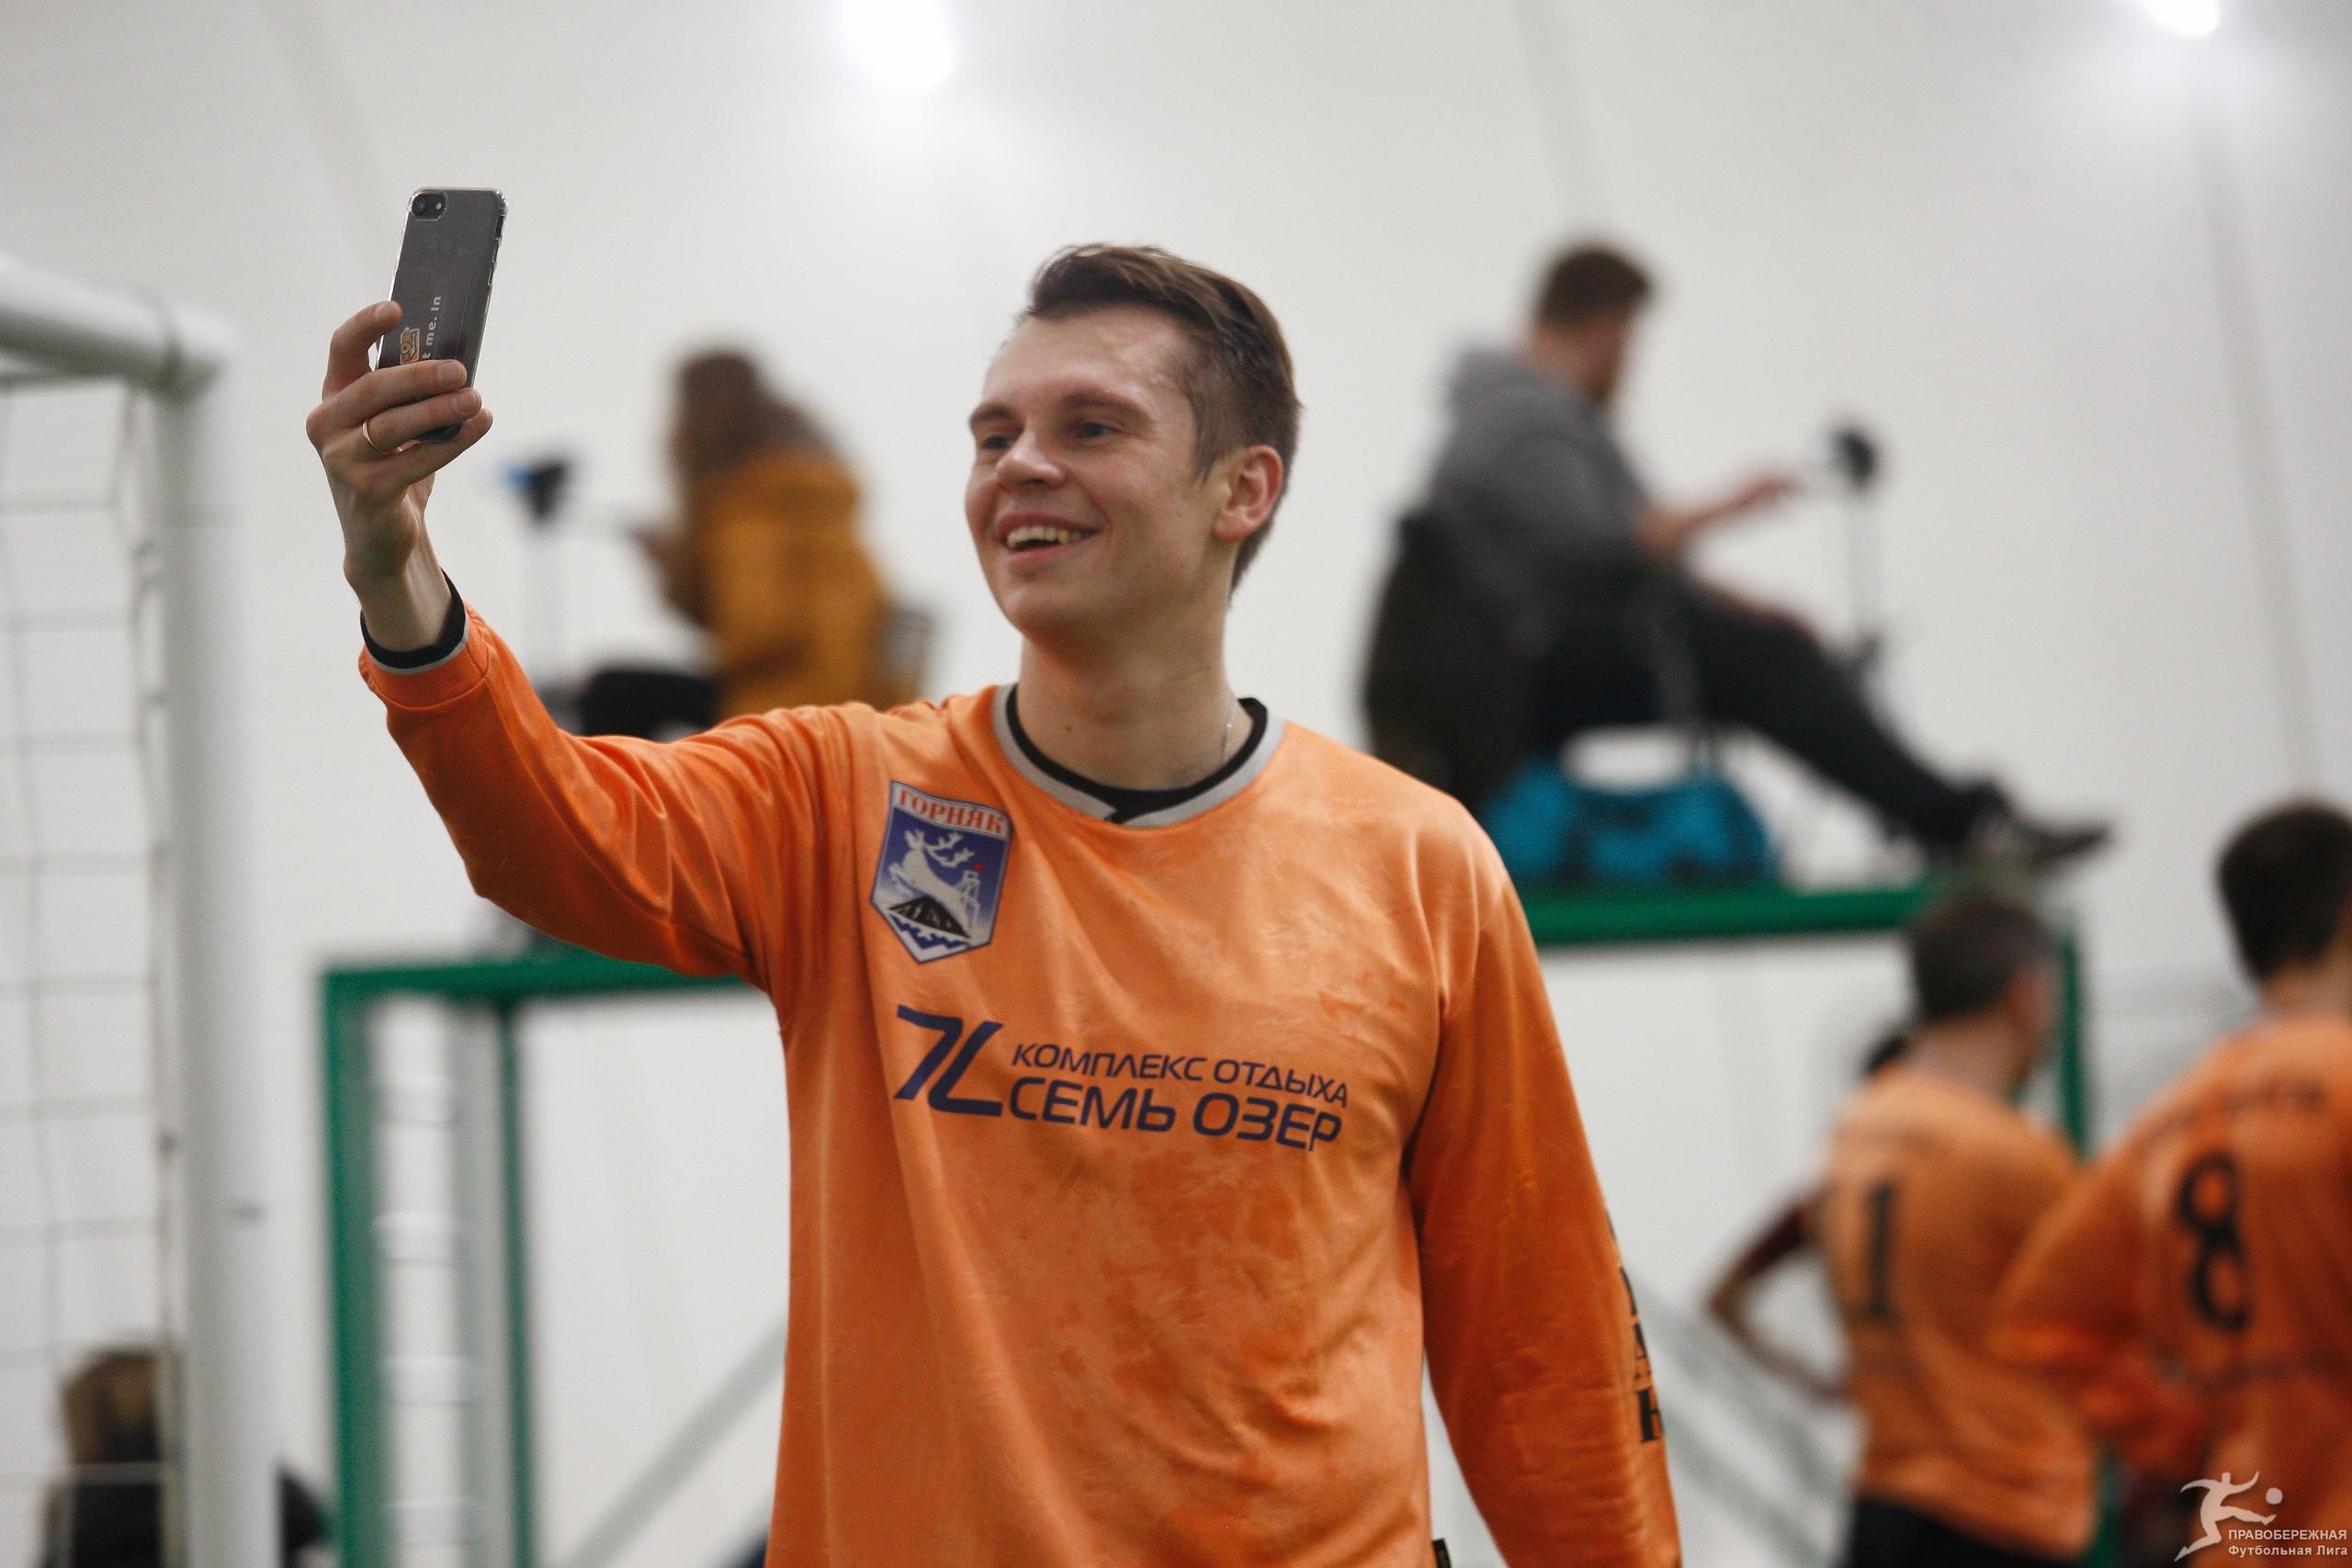 Сергей Алексеев (